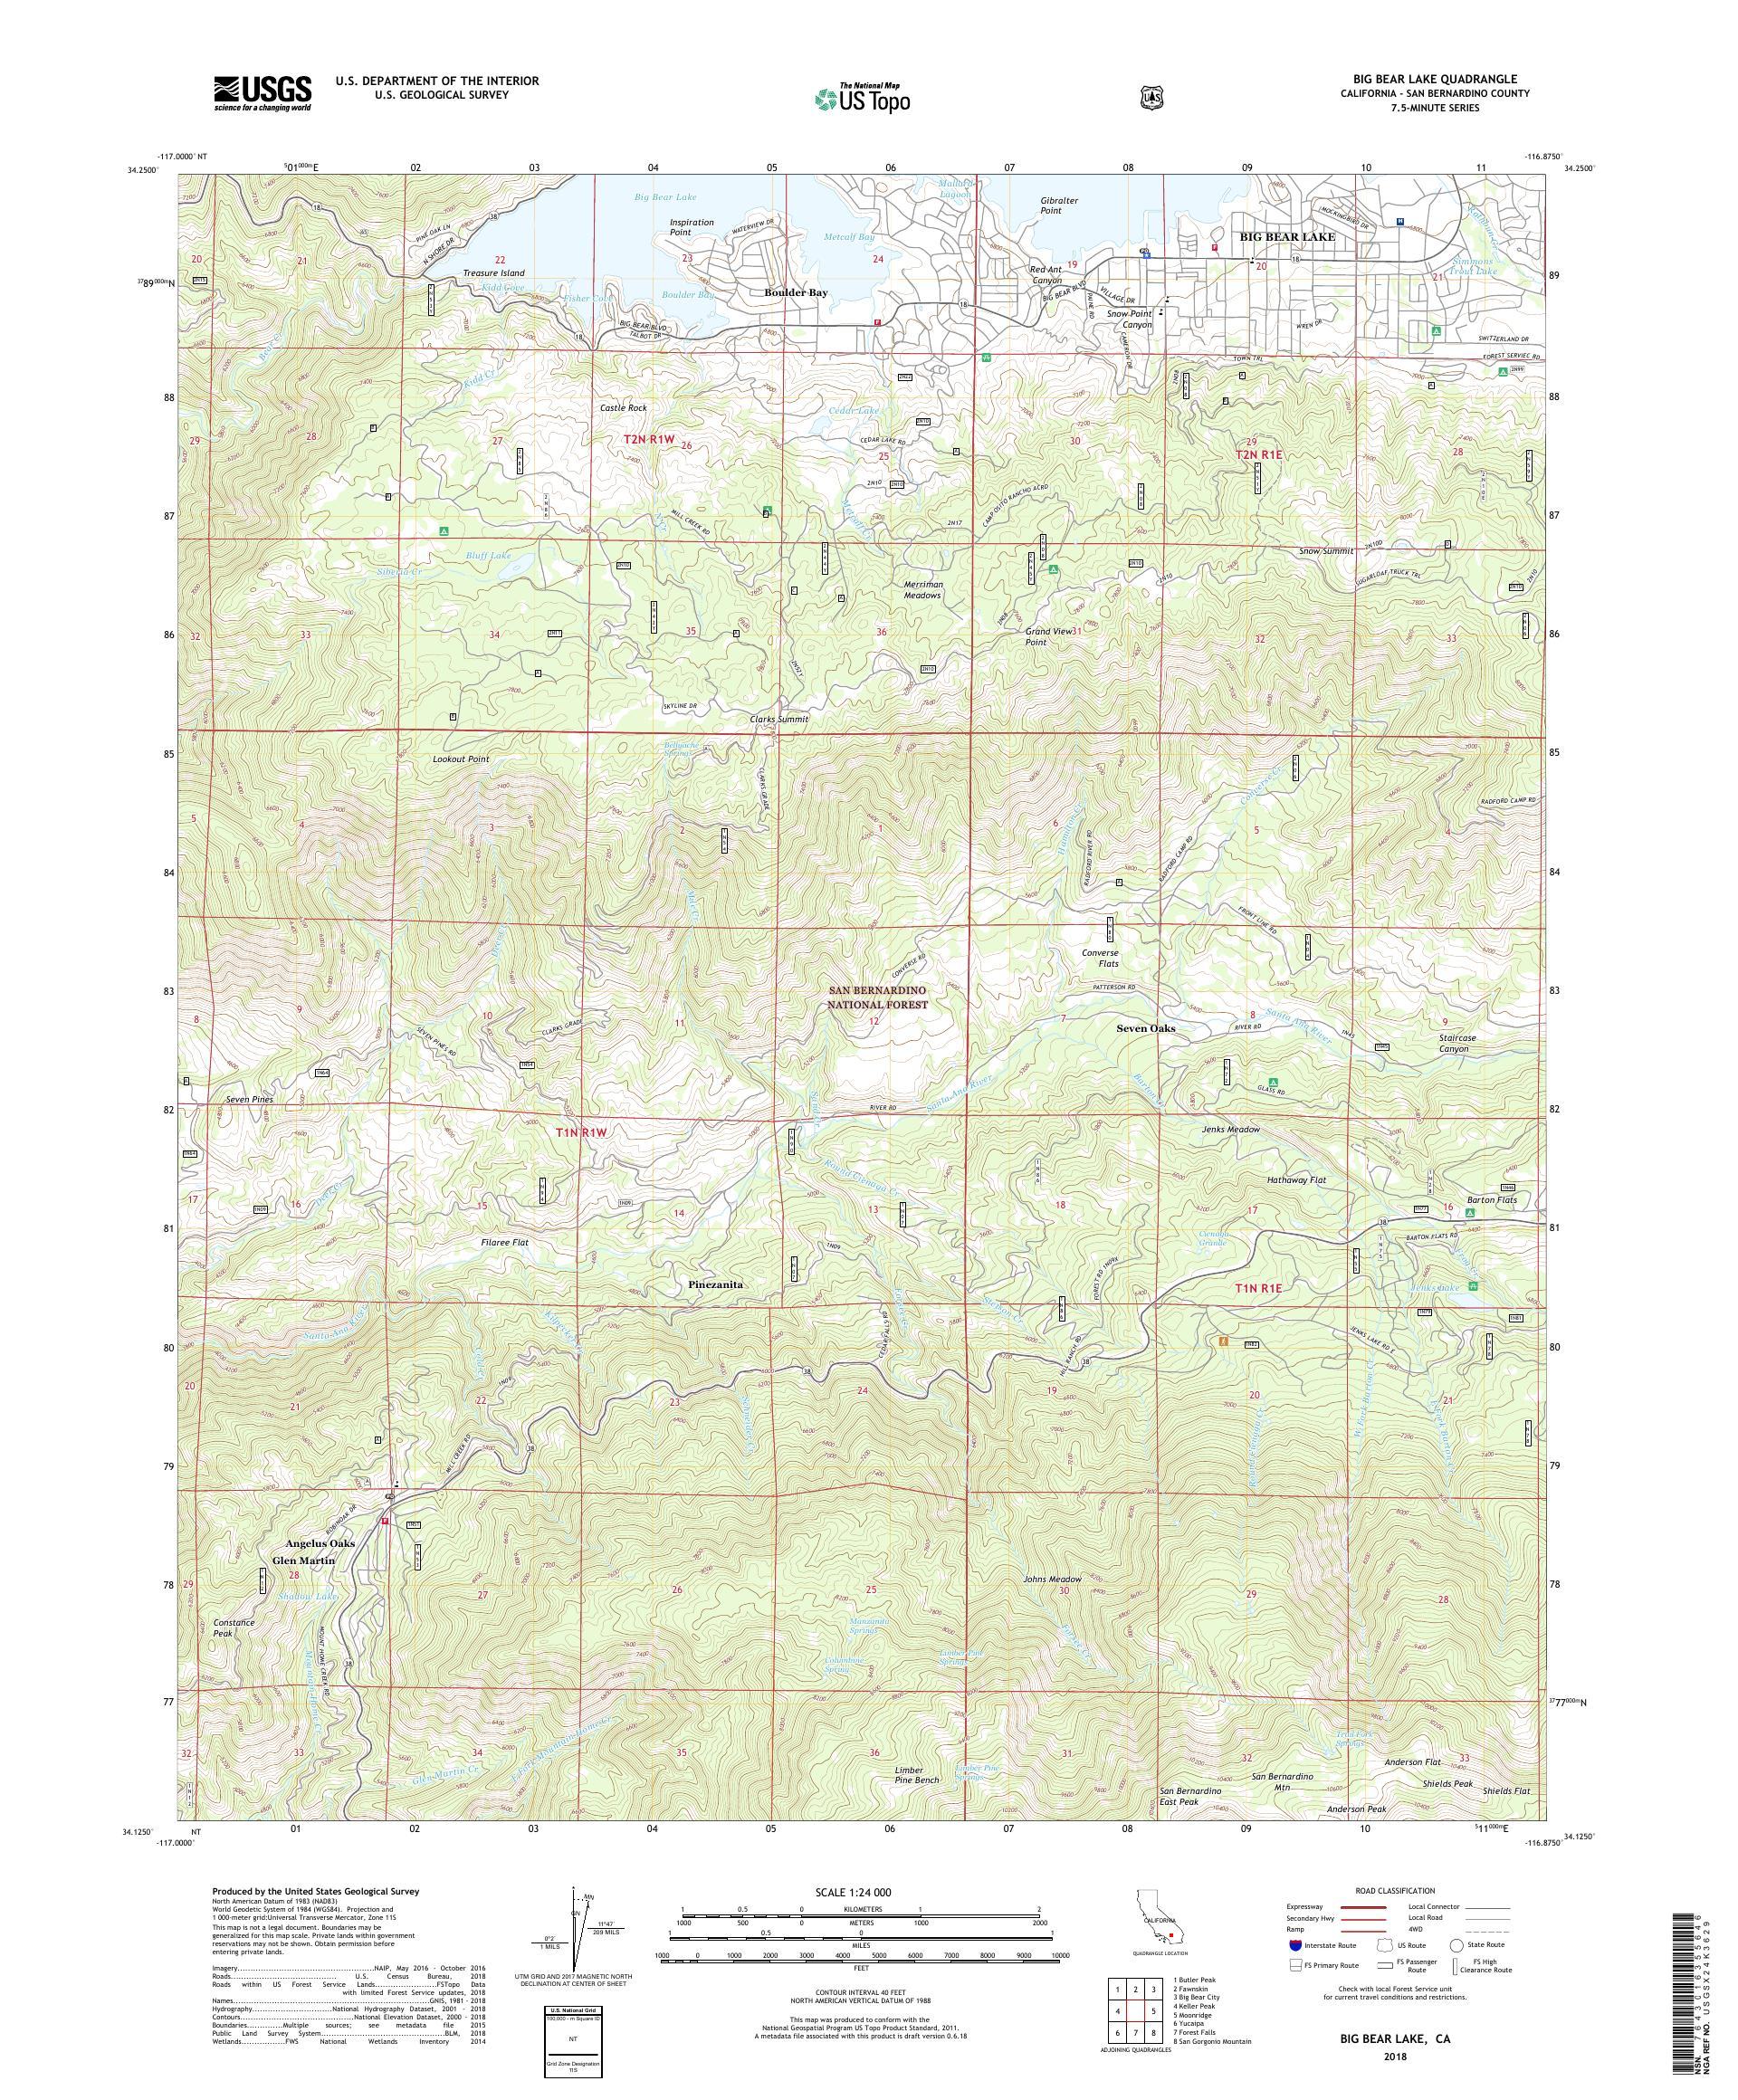 MyTopo Big Bear Lake, California USGS Quad Topo Map on map of no california, map of indio california, map of castaic california, map of coto de caza california, map of laguna hills california, map of colorado river california, map of calimesa california, map of san juan capistrano california, map of southern california, map of romoland california, map of rancho palos verdes california, map of patton california, map of sugarloaf california, map of kings county california, map of the inland empire california, map of desert hot springs california, map of marina del rey california, map of crestline california, map of dana point california, map of middletown california,